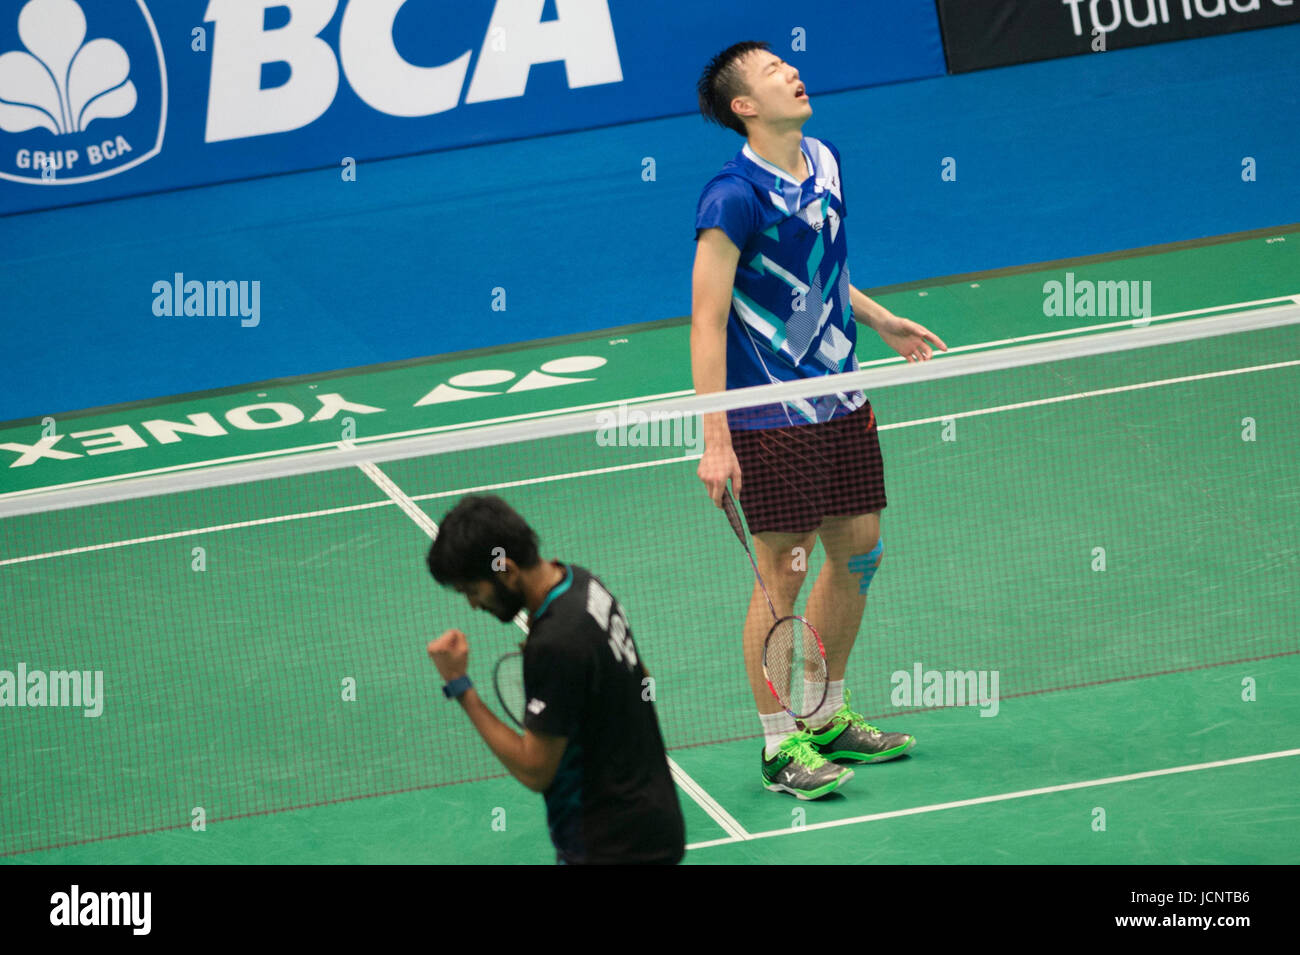 Jakarta Indonesia 16th June 2017 Tzu Wei Wang of Chinese